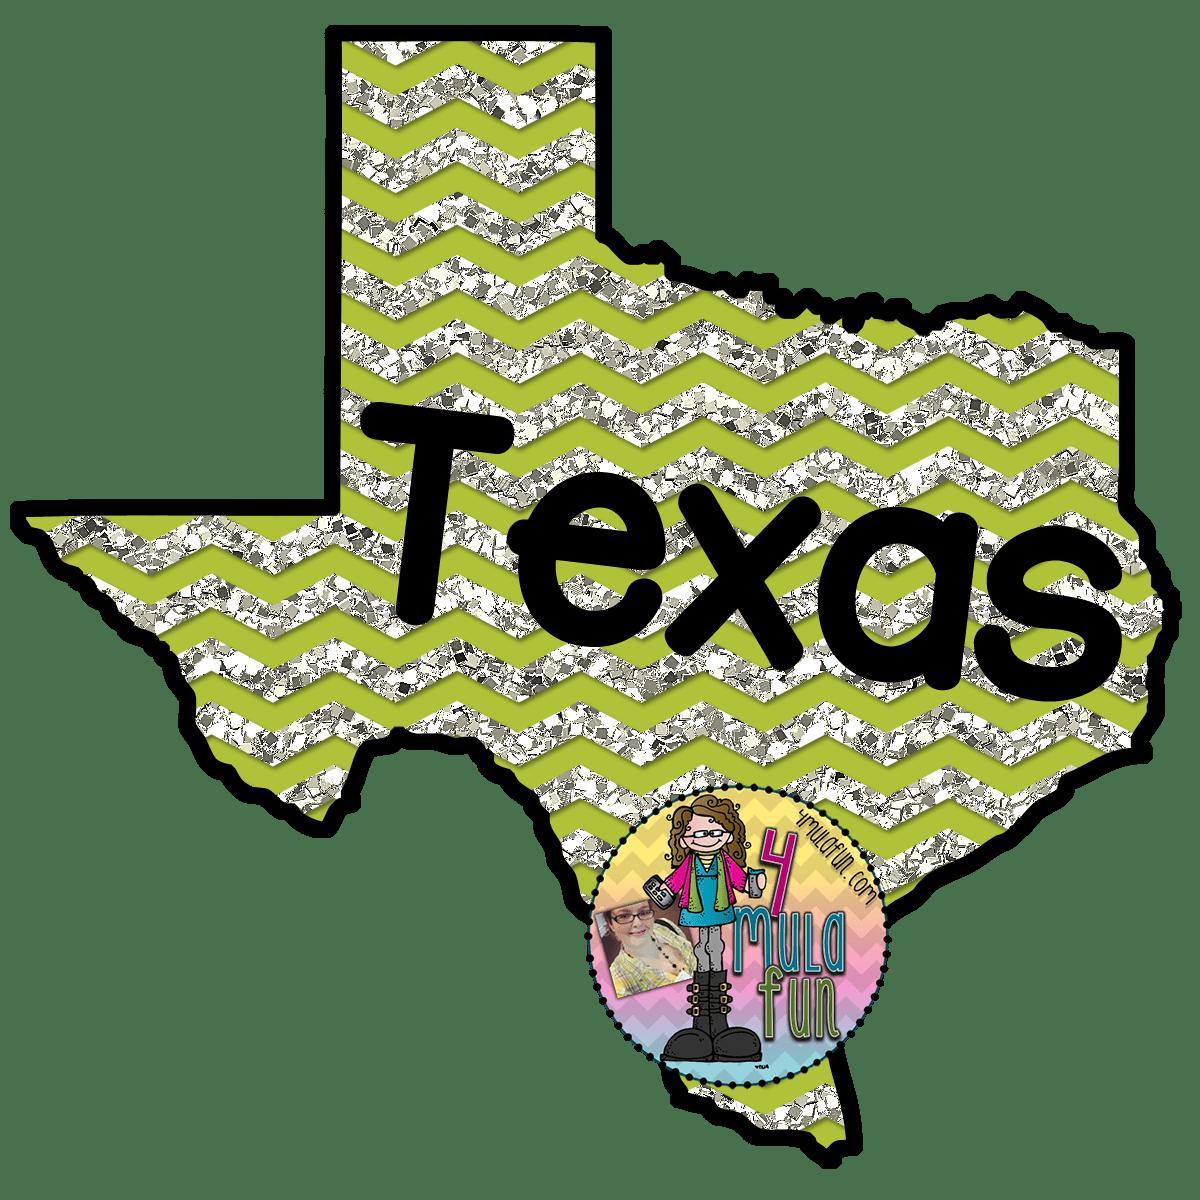 OurMis_Texas_4mulaFun